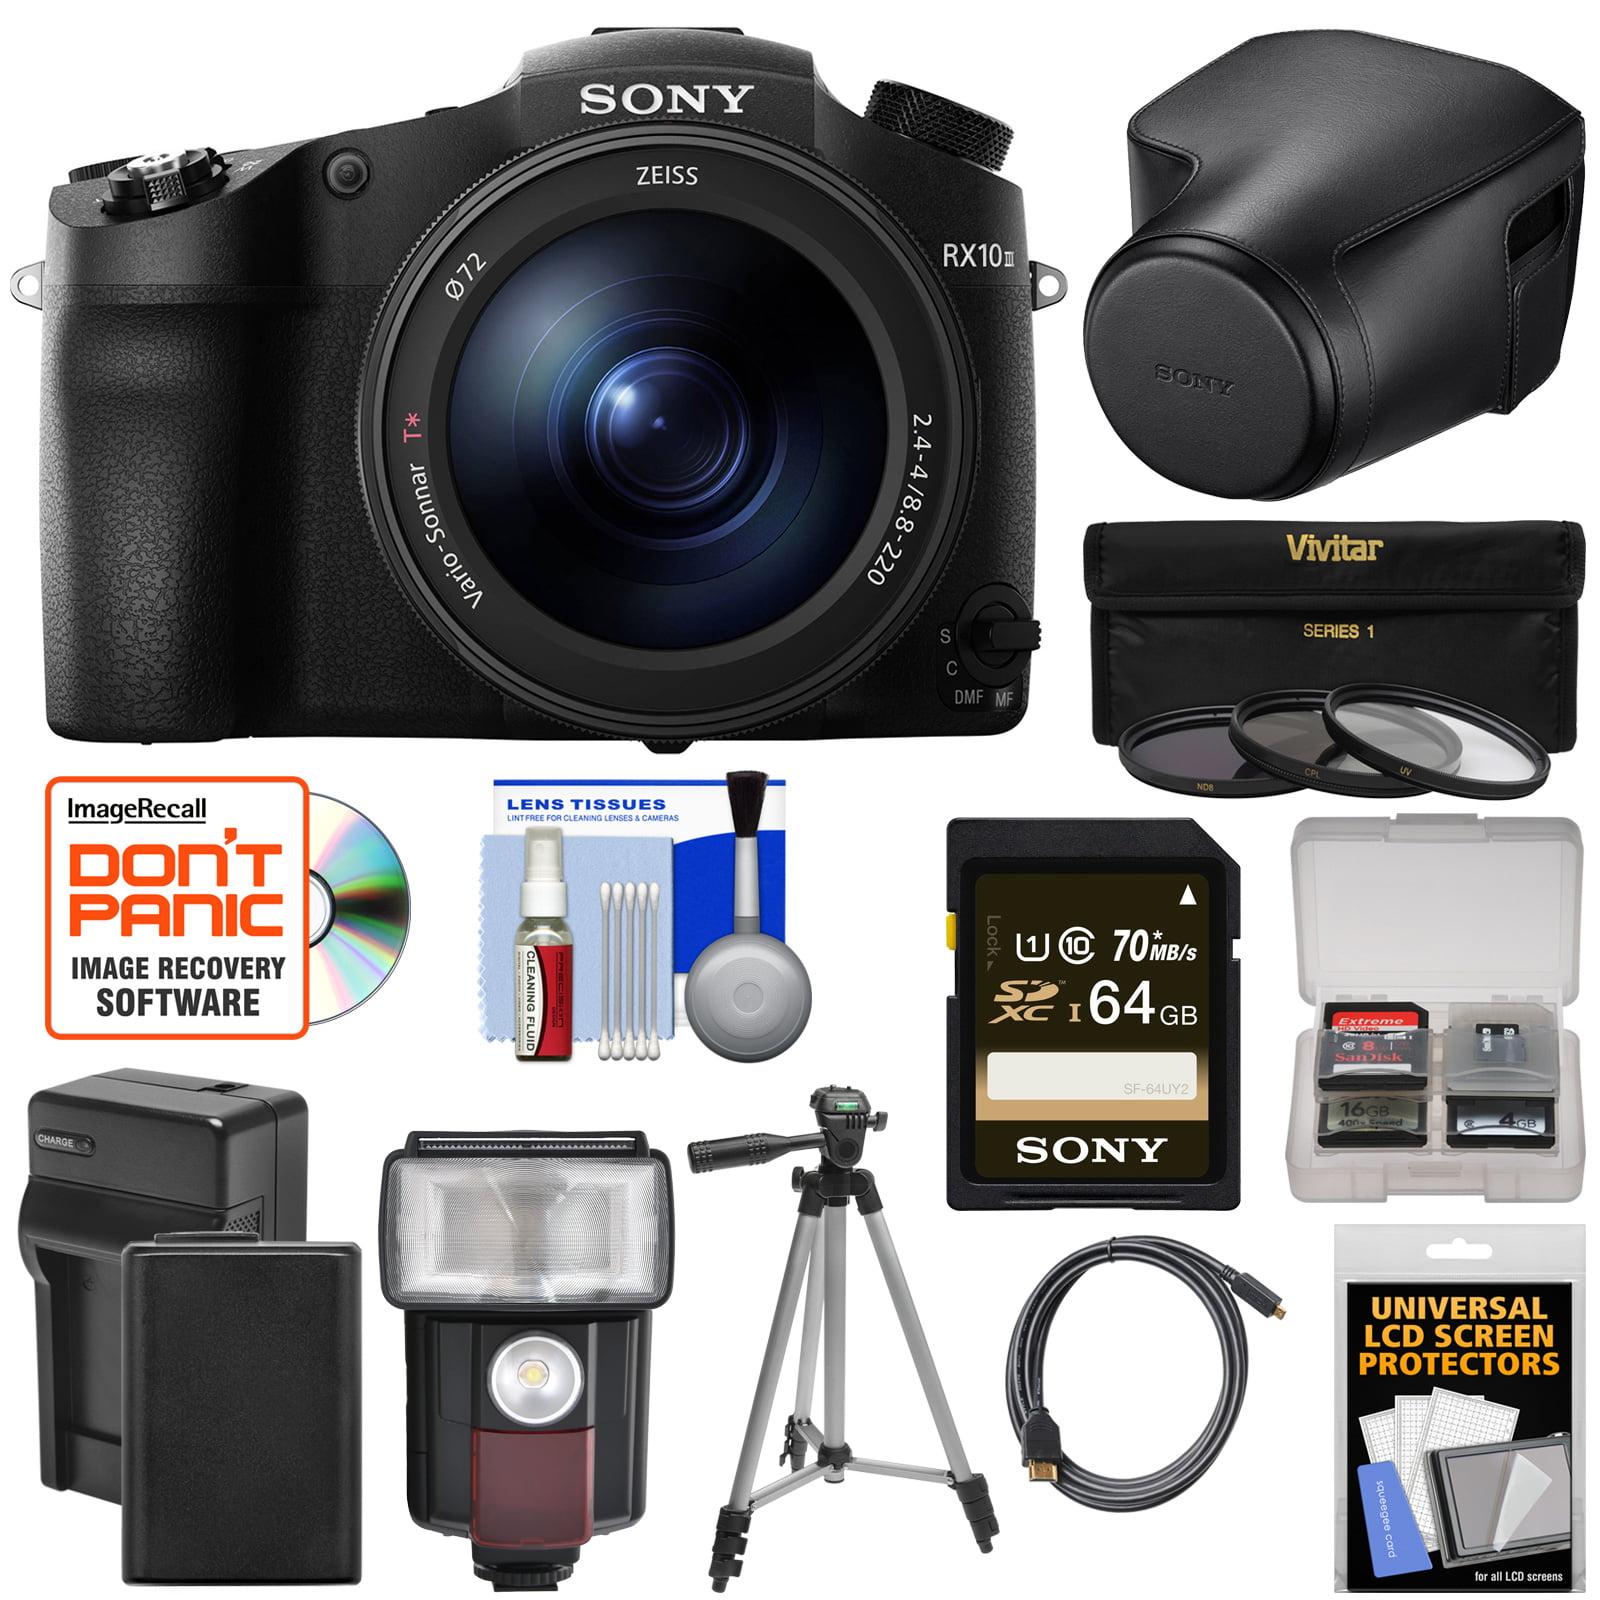 Sony Cyber-Shot DSC-RX10 III 4K Wi-Fi Digital Camera with LCJ-RXJ Leather Case + 64GB Card + Battery & Charger + Flash + Filters + Tripod + Kit DSCRX10M3/B-93643-Kit